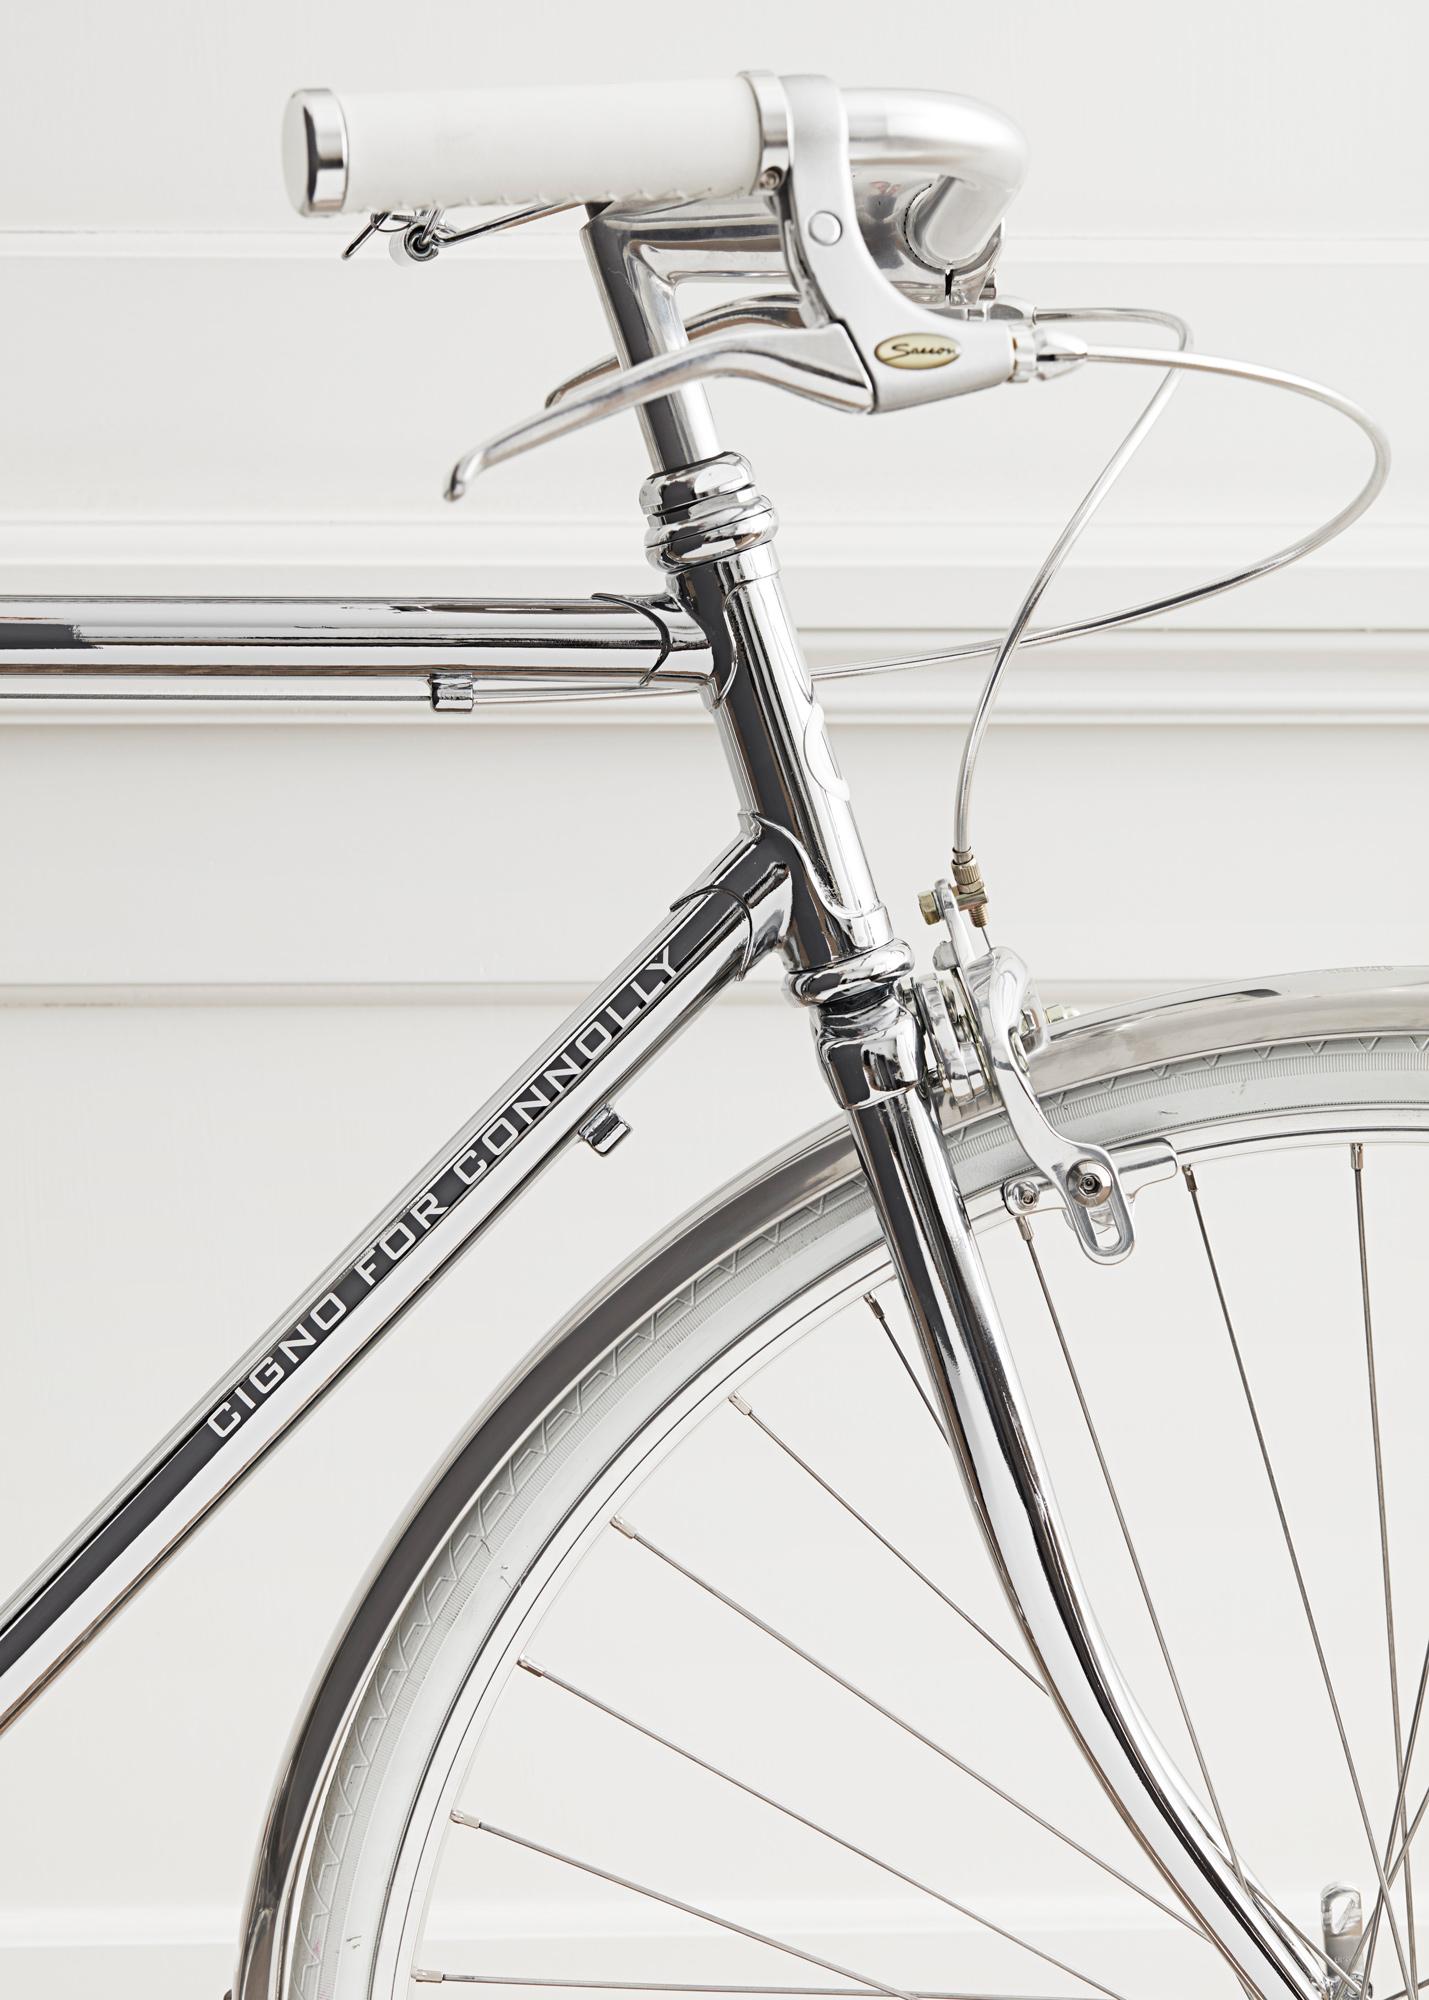 Cigno x Connolly Hand Made Bike